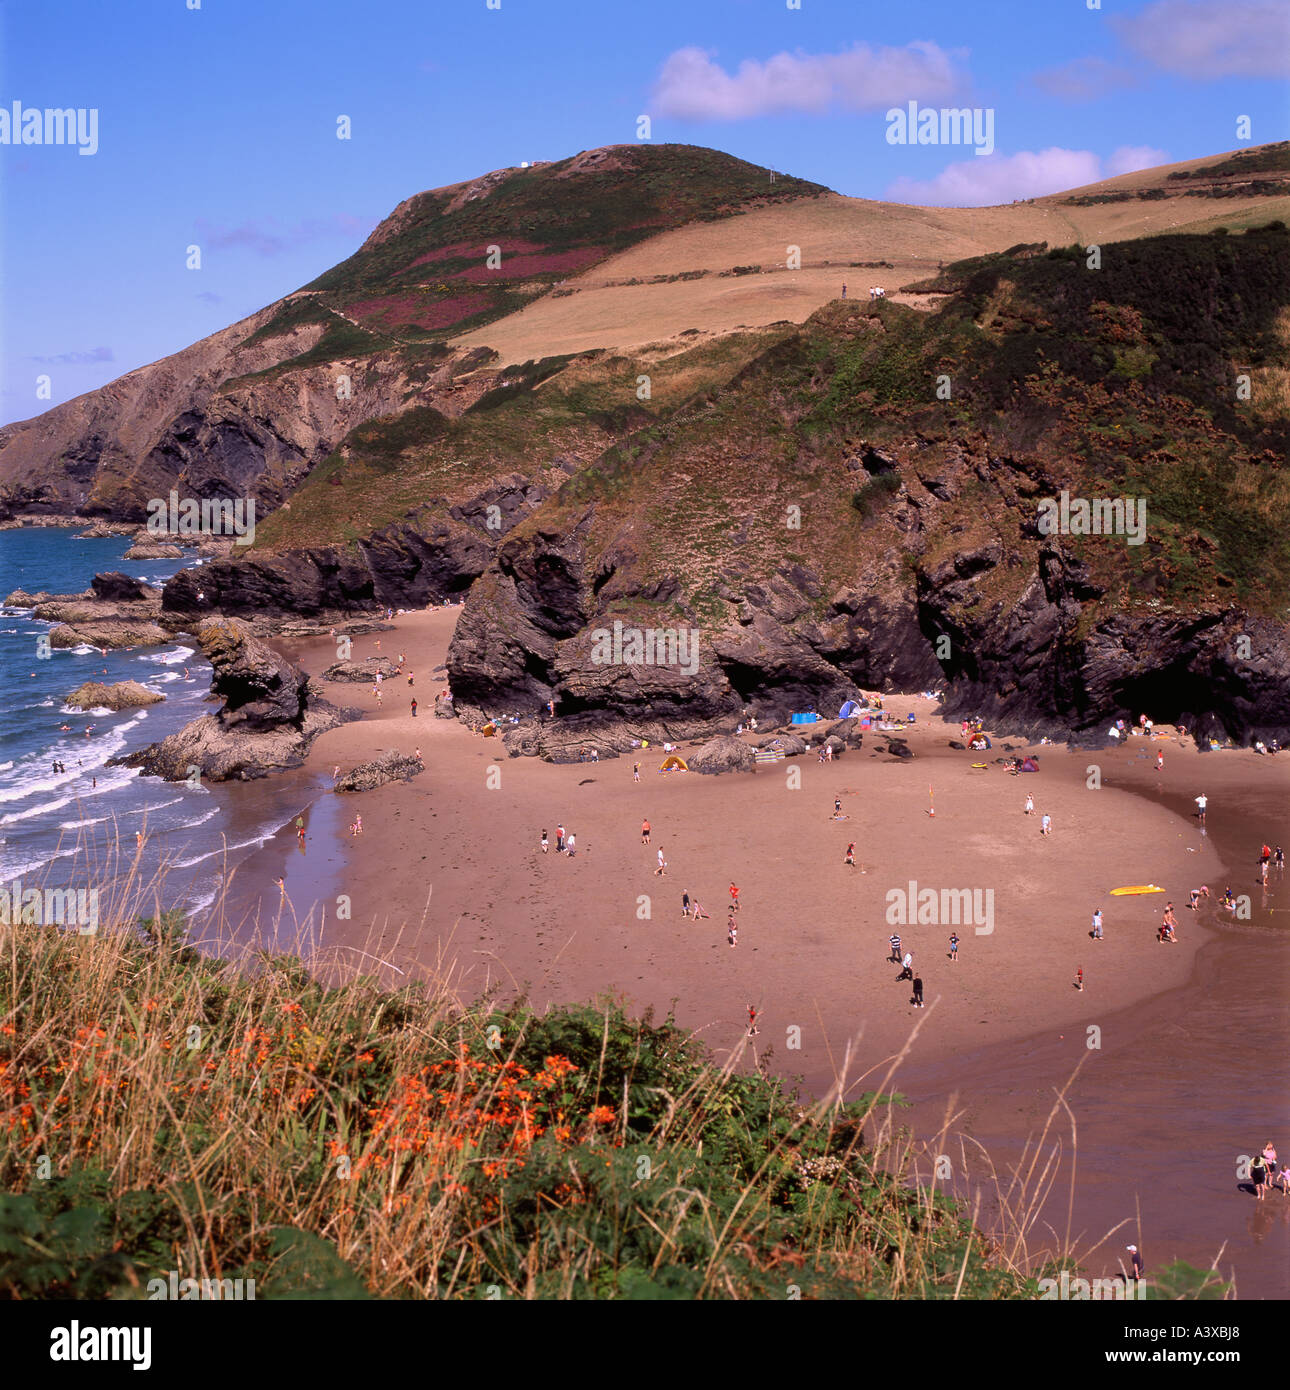 Bathers on the sands at Llangranog Cardigan Wales UK - Stock Image